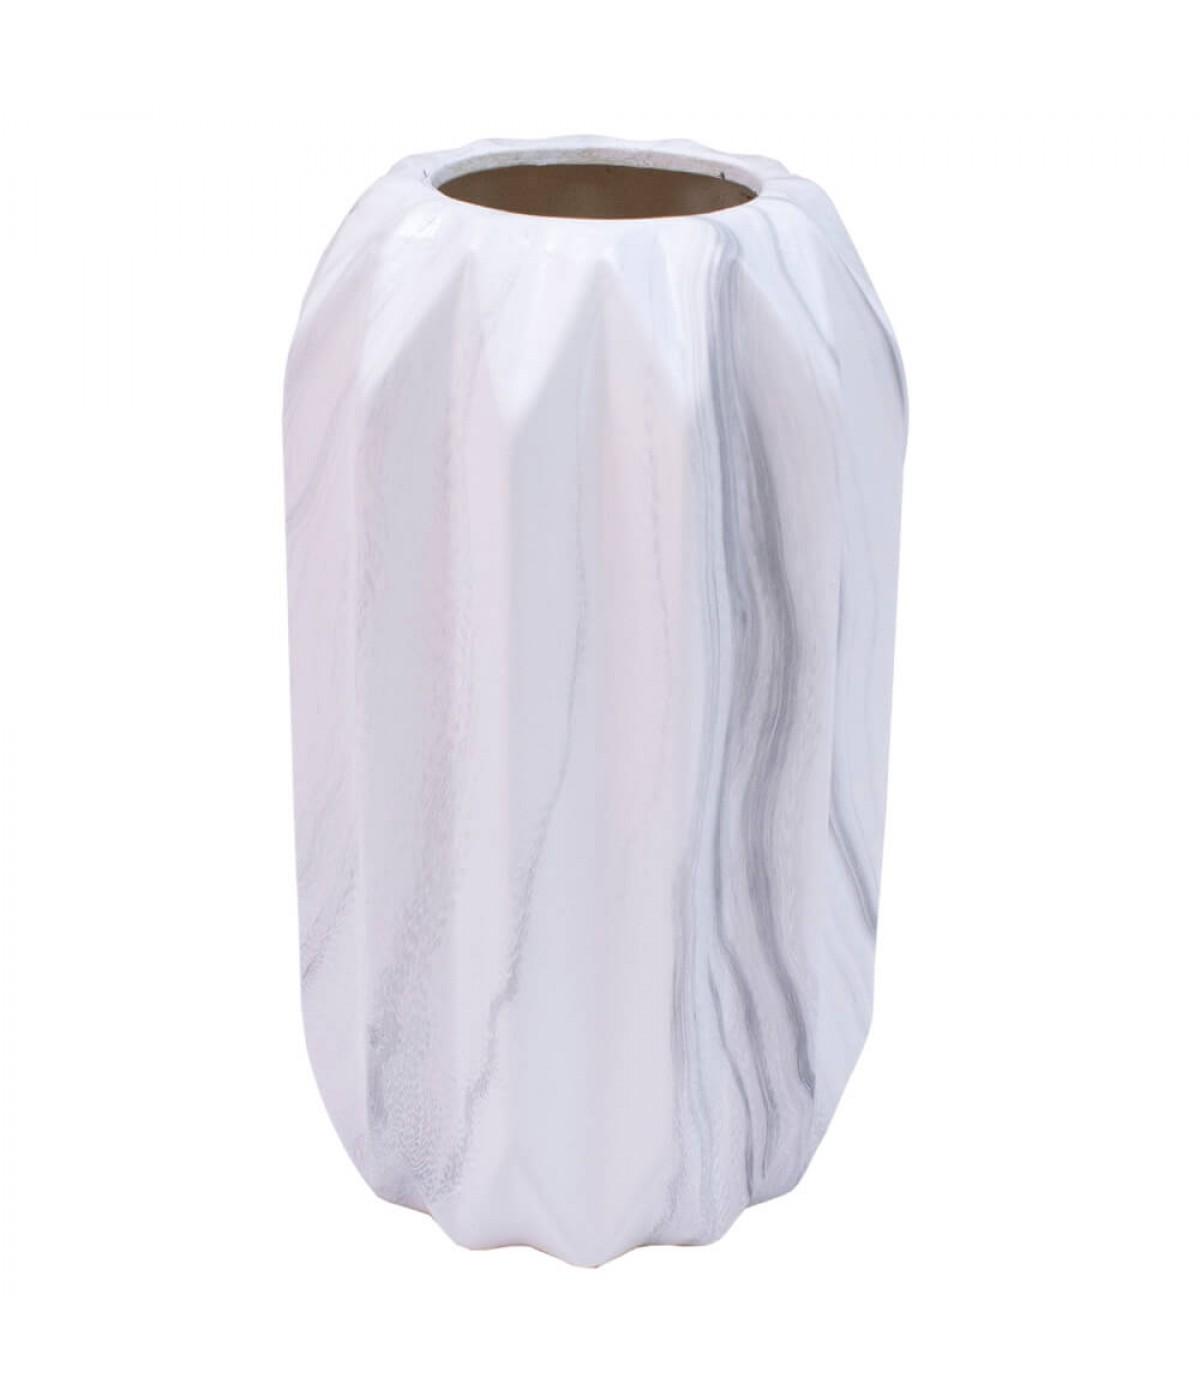 Vaso Porcelana Branca 20x11.5x11.5cm